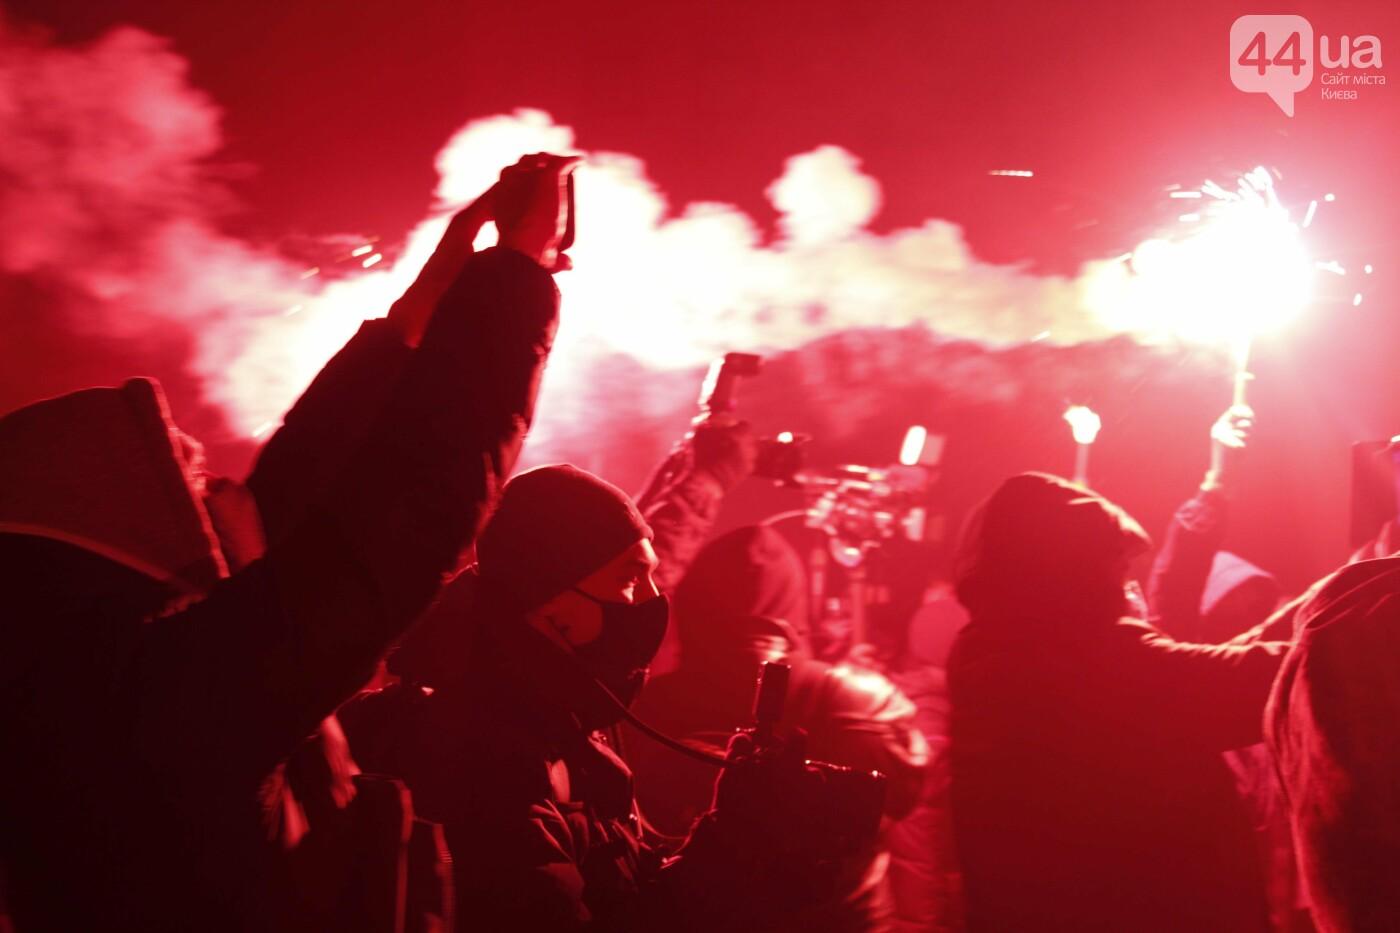 Сожгли табличку и разбили окна: акция в поддержку Стерненко переросла в беспорядки, - ФОТО, фото-15, Фото: 44.ua